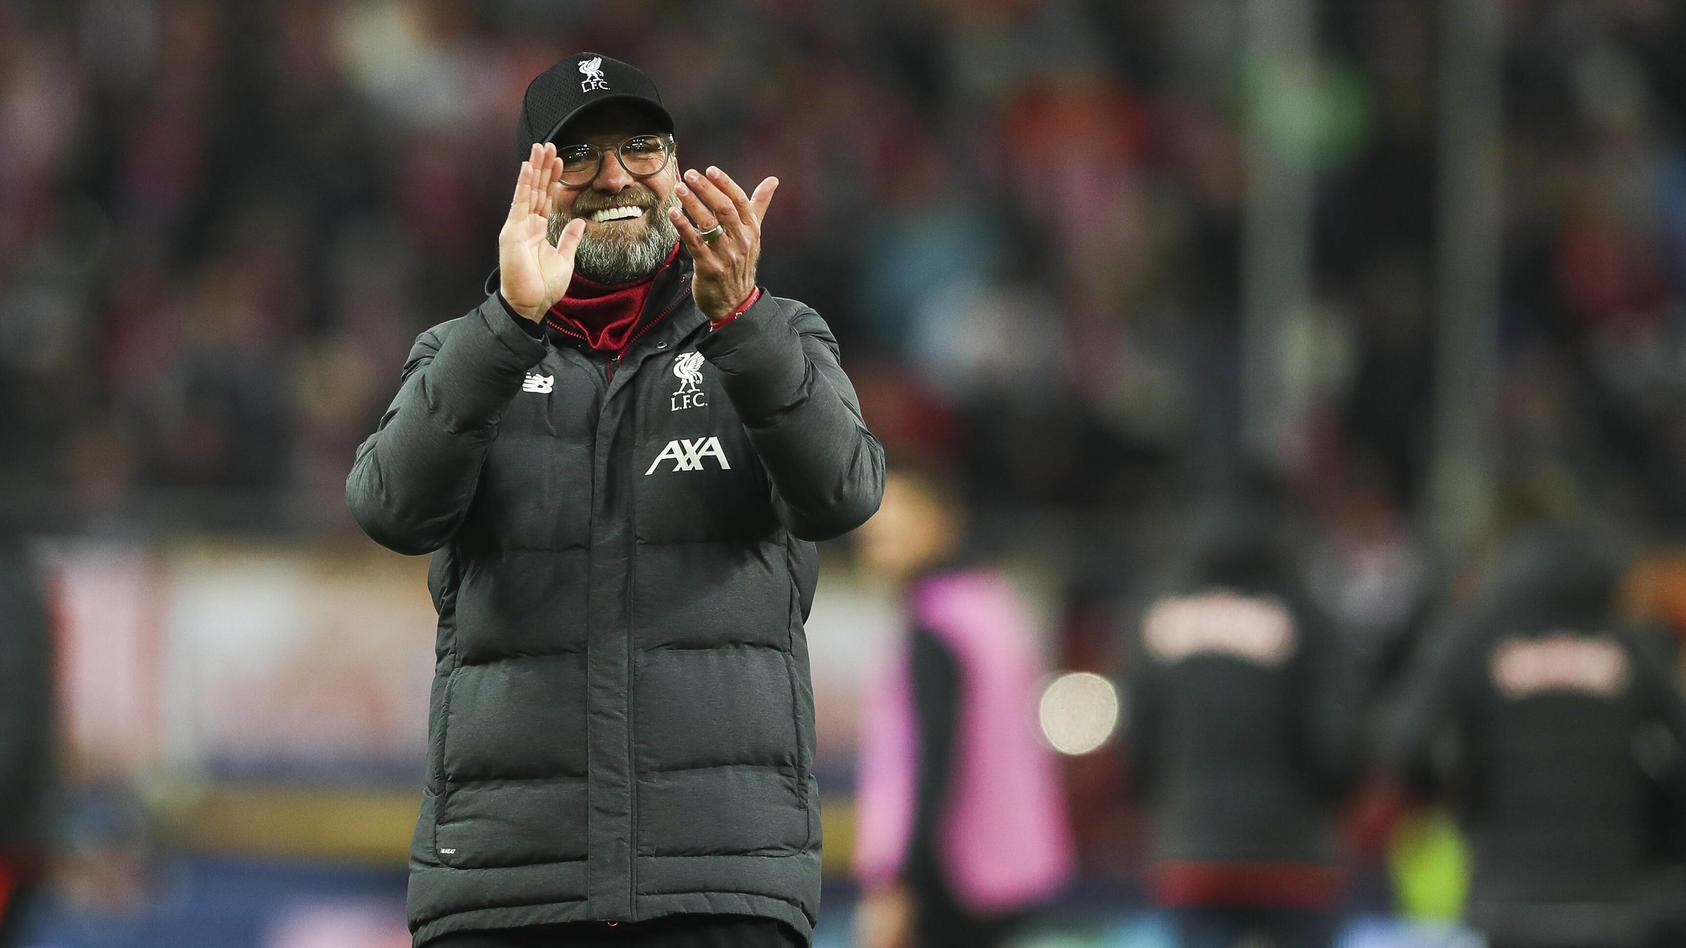 SOCCER - CL, RBS vs Liverpool SALZBURG,AUSTRIA,10.DEC.19 - SOCCER - UEFA Champions League, group stage, Red Bull Salzbu